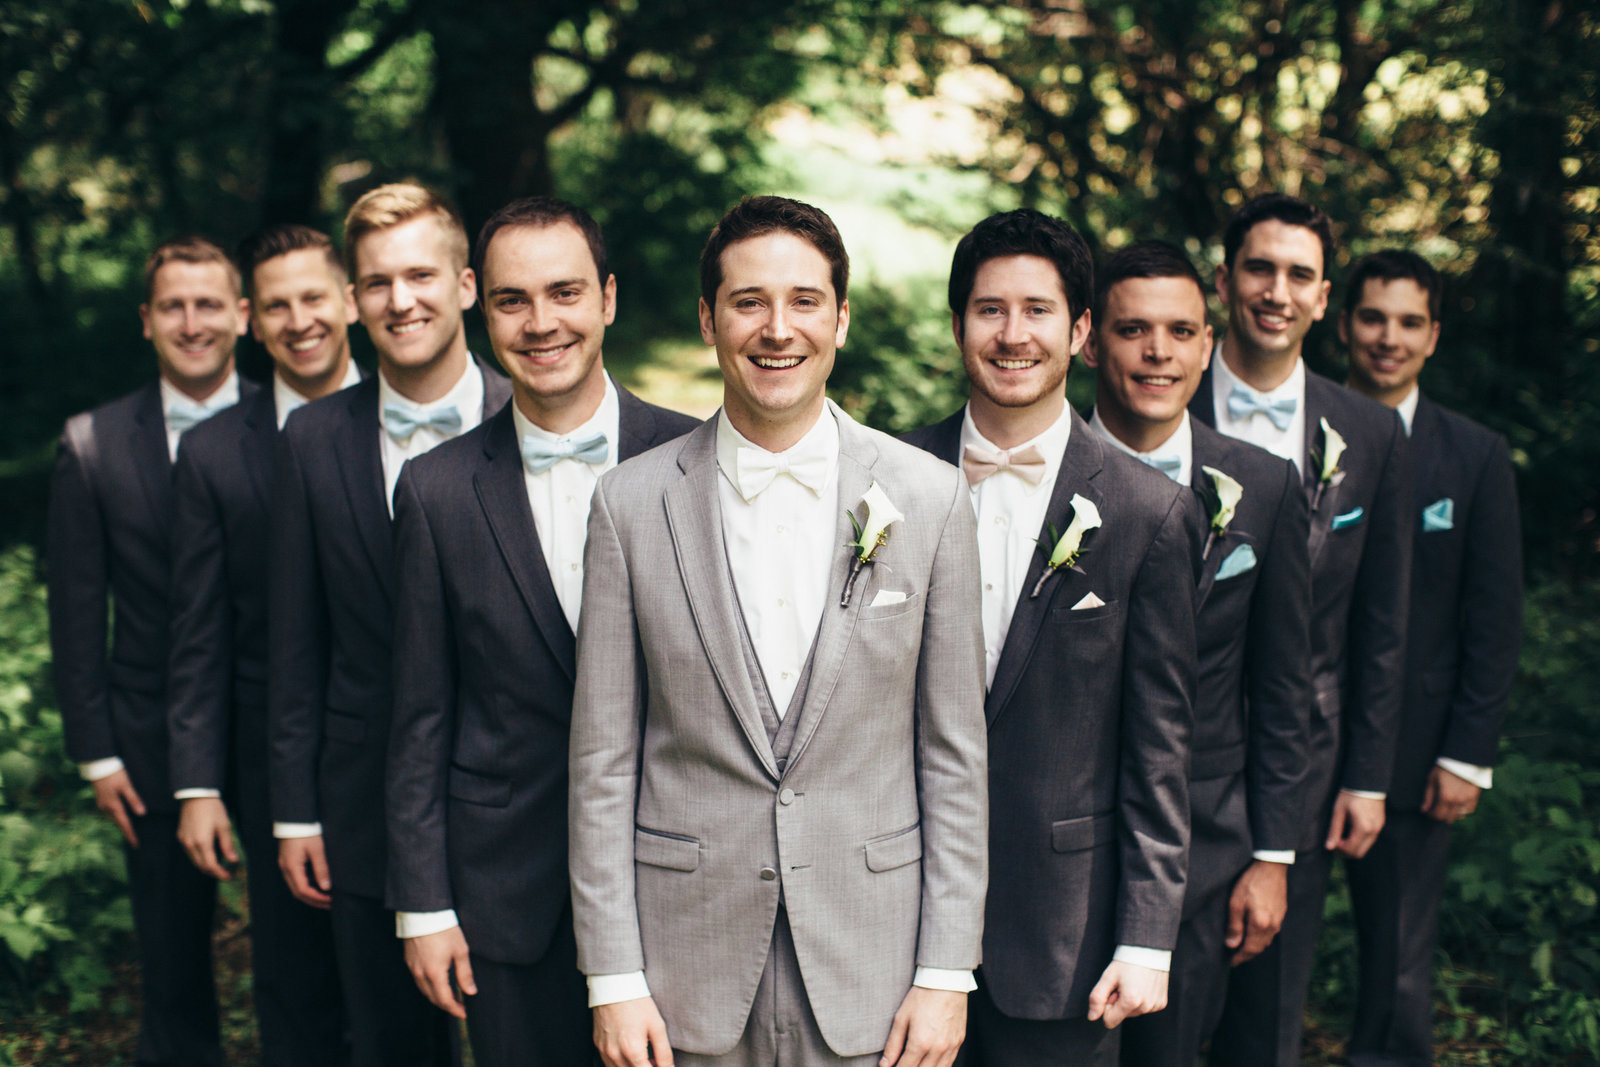 Wedding Shoppe Brian Bossany 2015 Brides-Grace Zach-0042